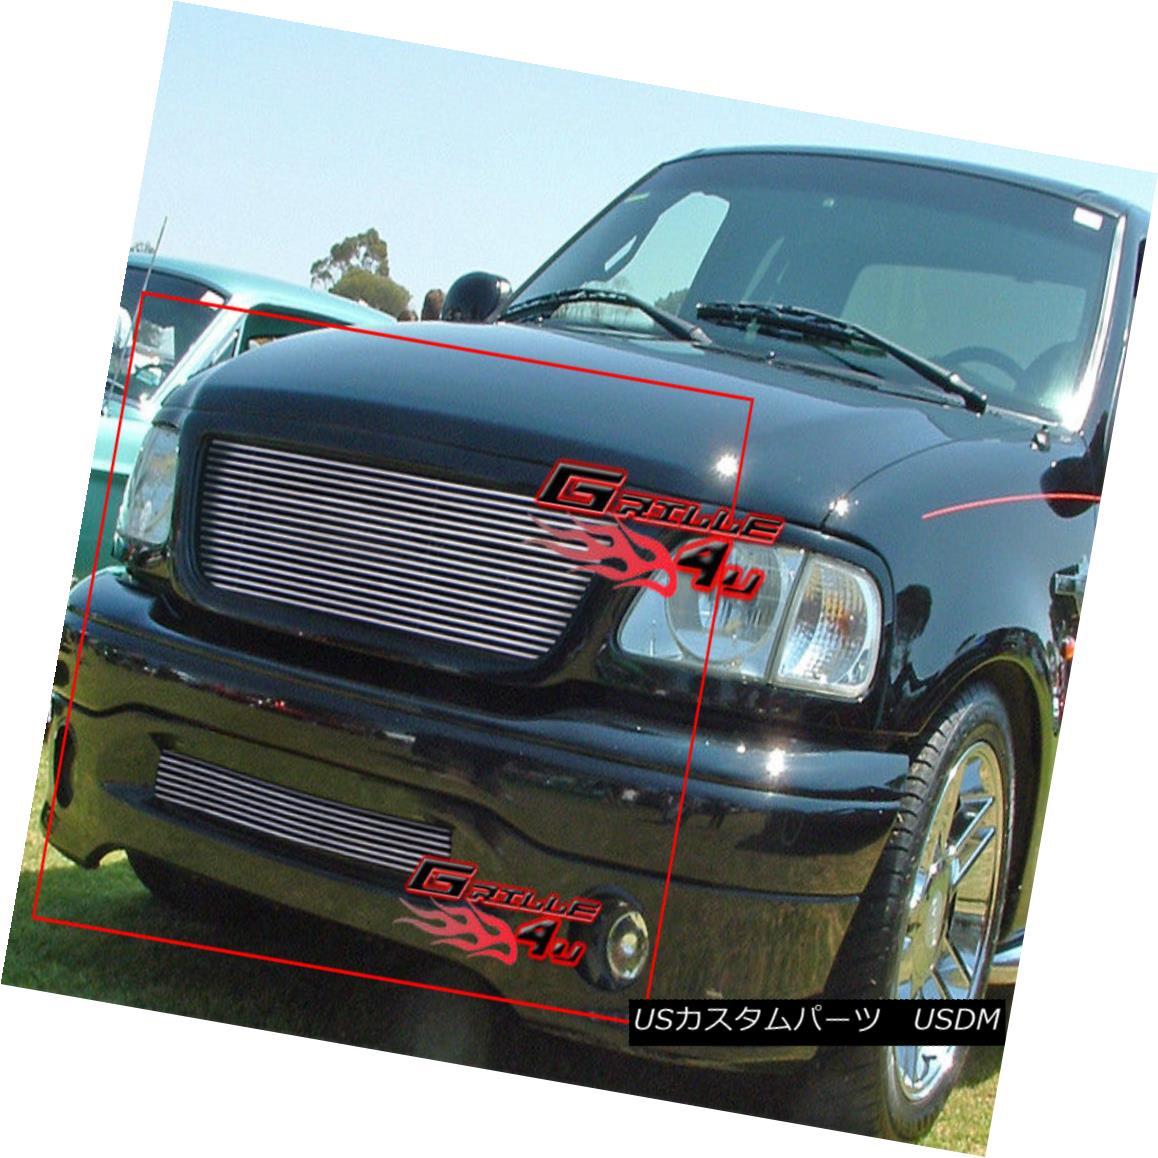 USグリル For 99-03 Ford F-150 Harley Davidson Billet Grille Combo 99-03フォードF-150ハーレーダビッドソンビレットグリルコンボ用